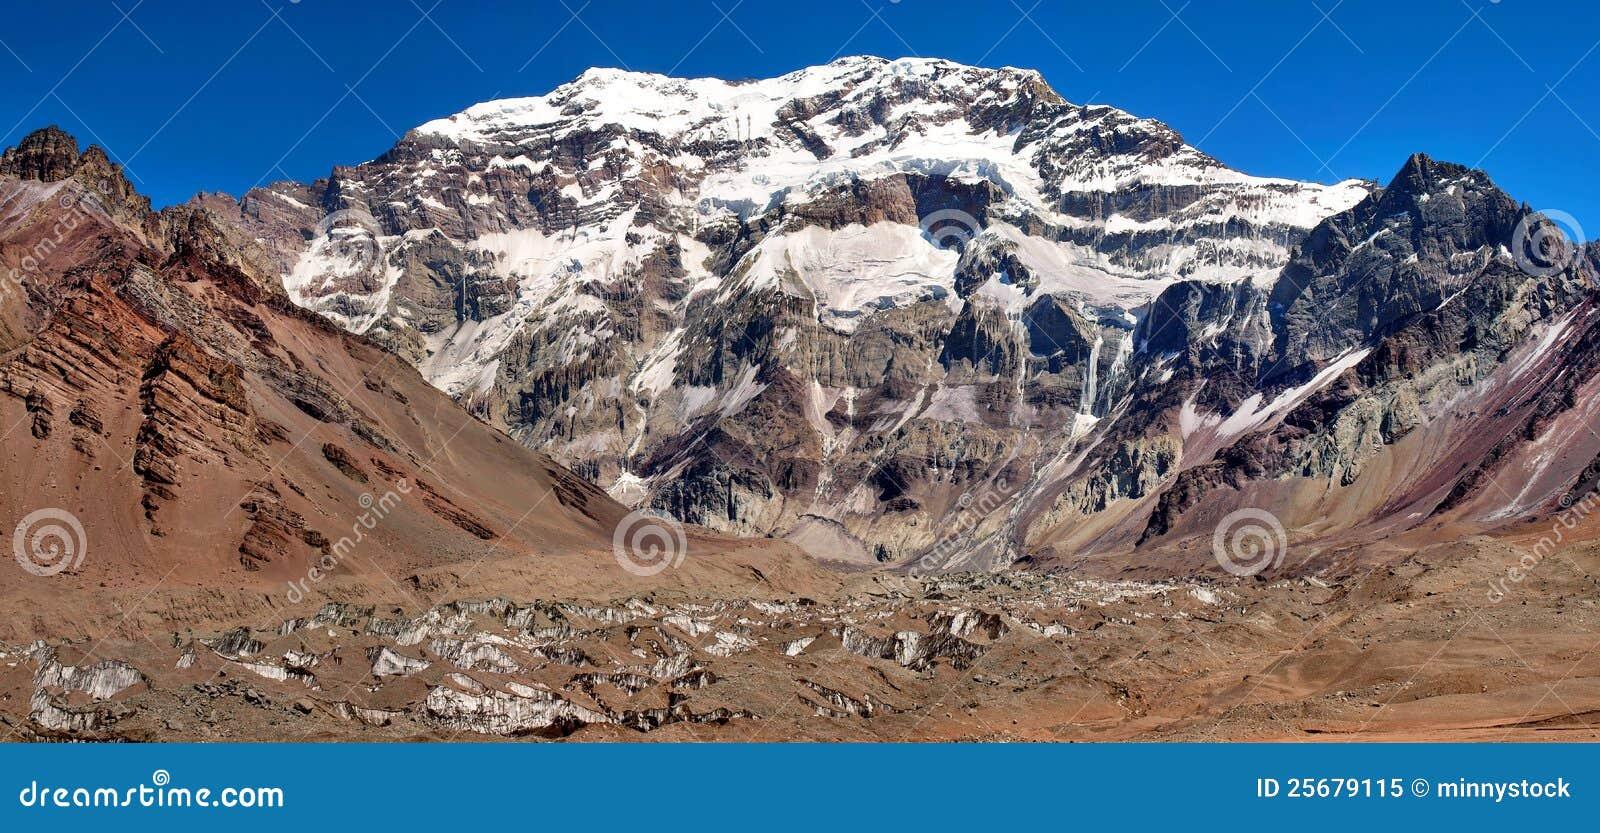 Höchster Berg Amerika